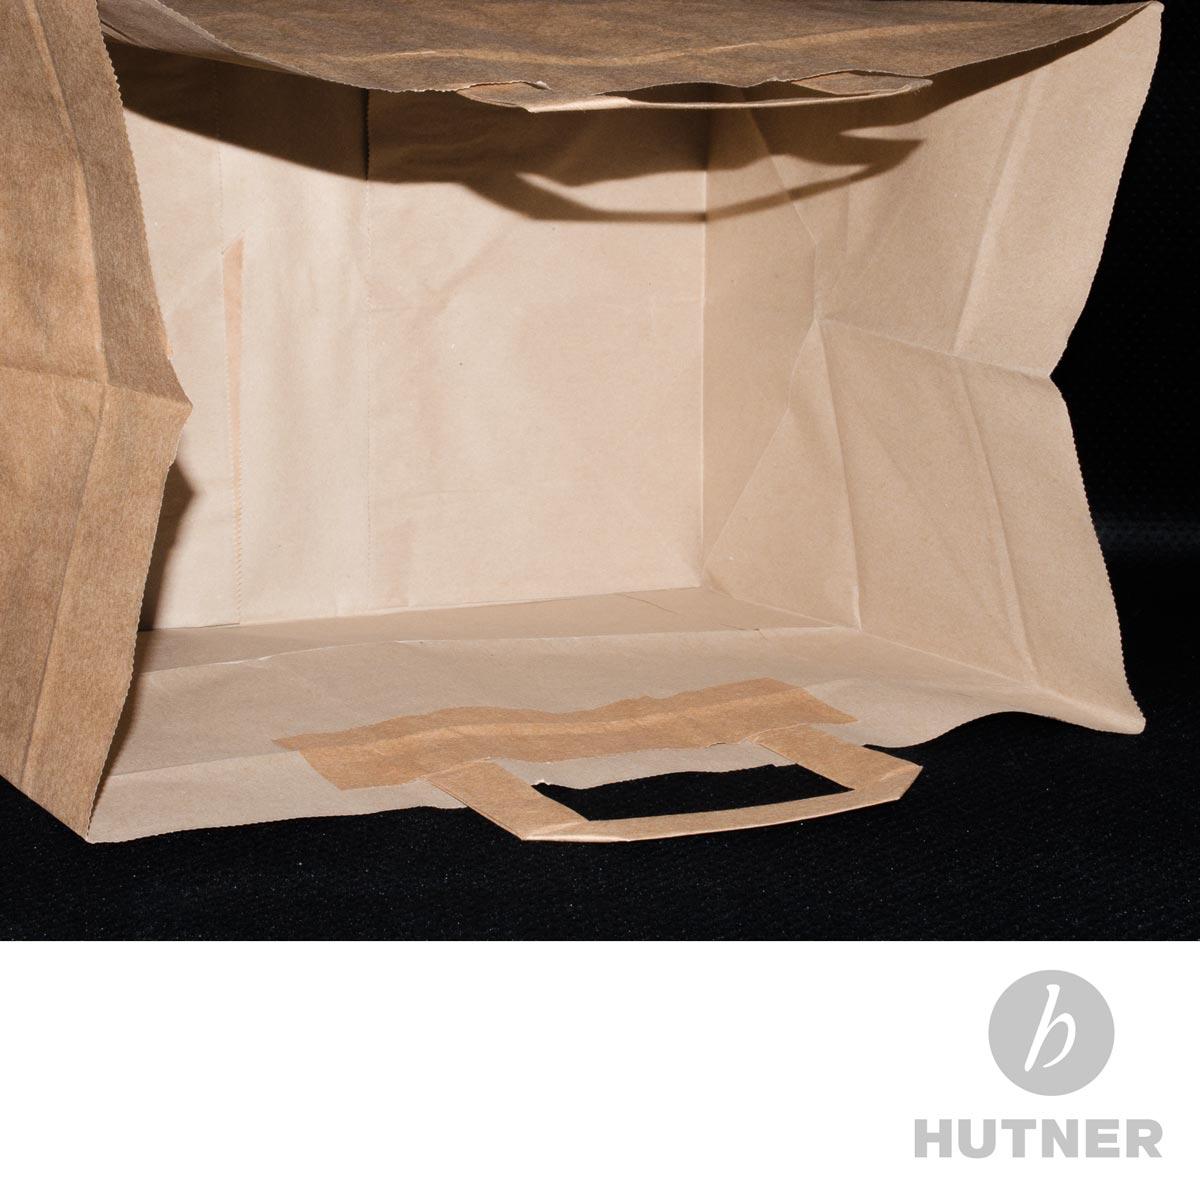 hutner b ckert ten braun weiss flachhenkel kuchentragetaschen papiertaschen. Black Bedroom Furniture Sets. Home Design Ideas